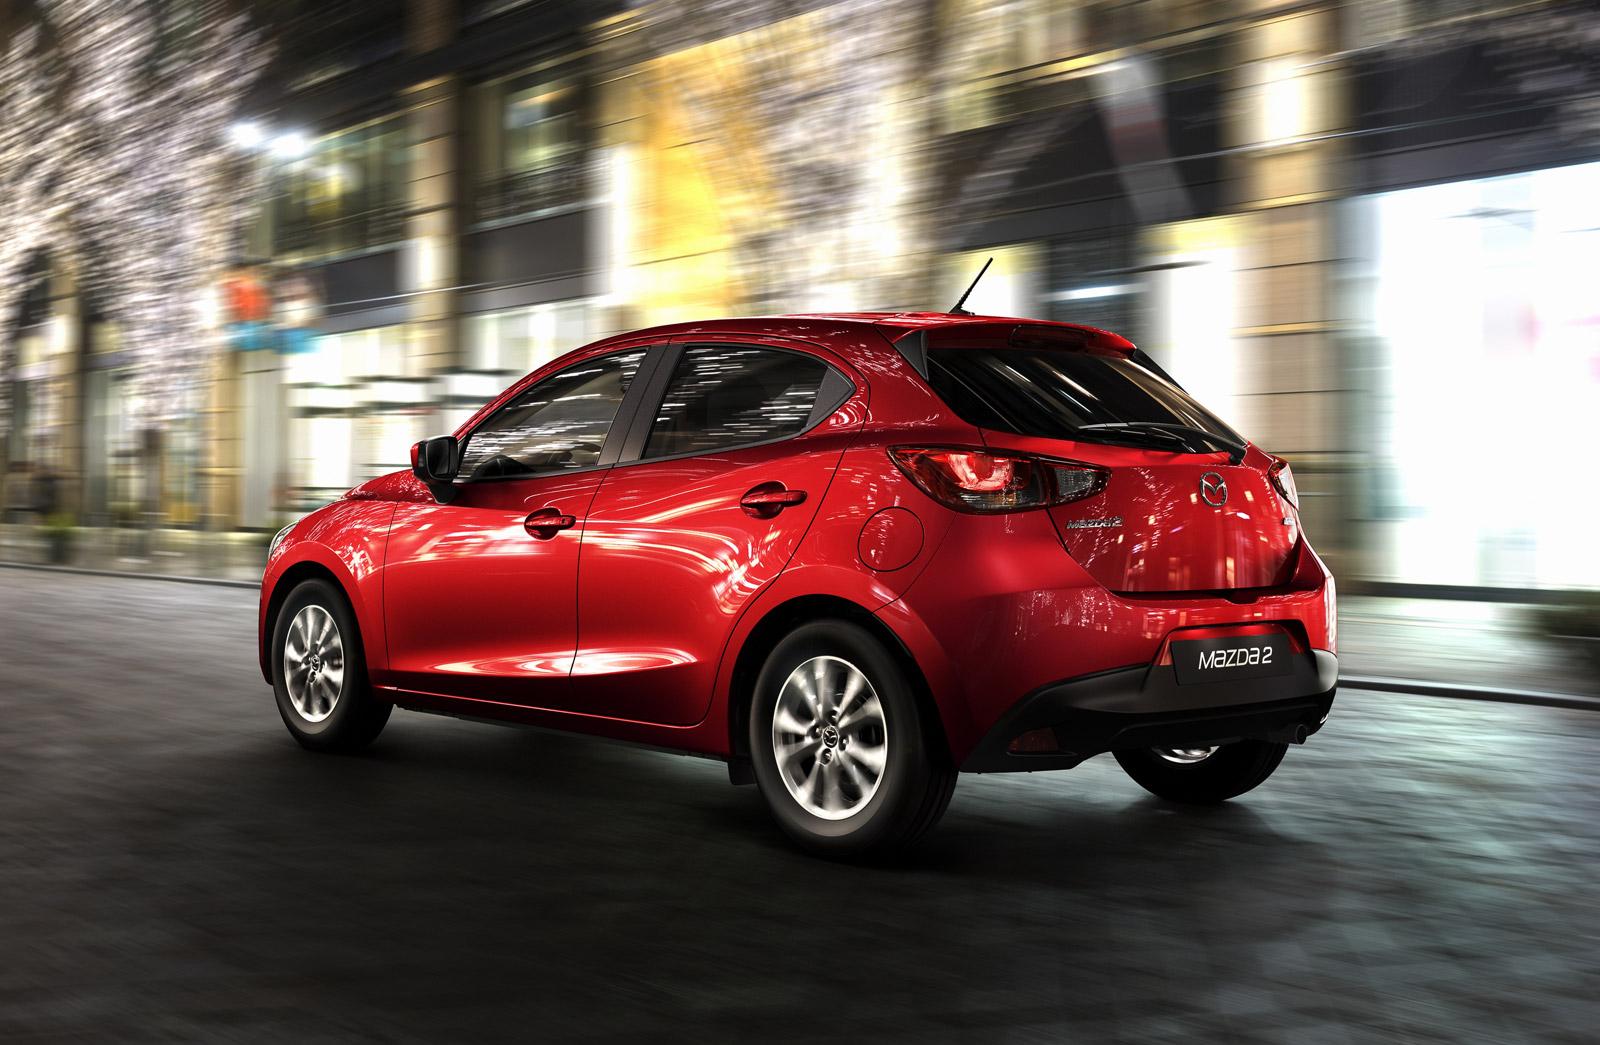 2015 Mazda 2 17 Desktop Wallpaper